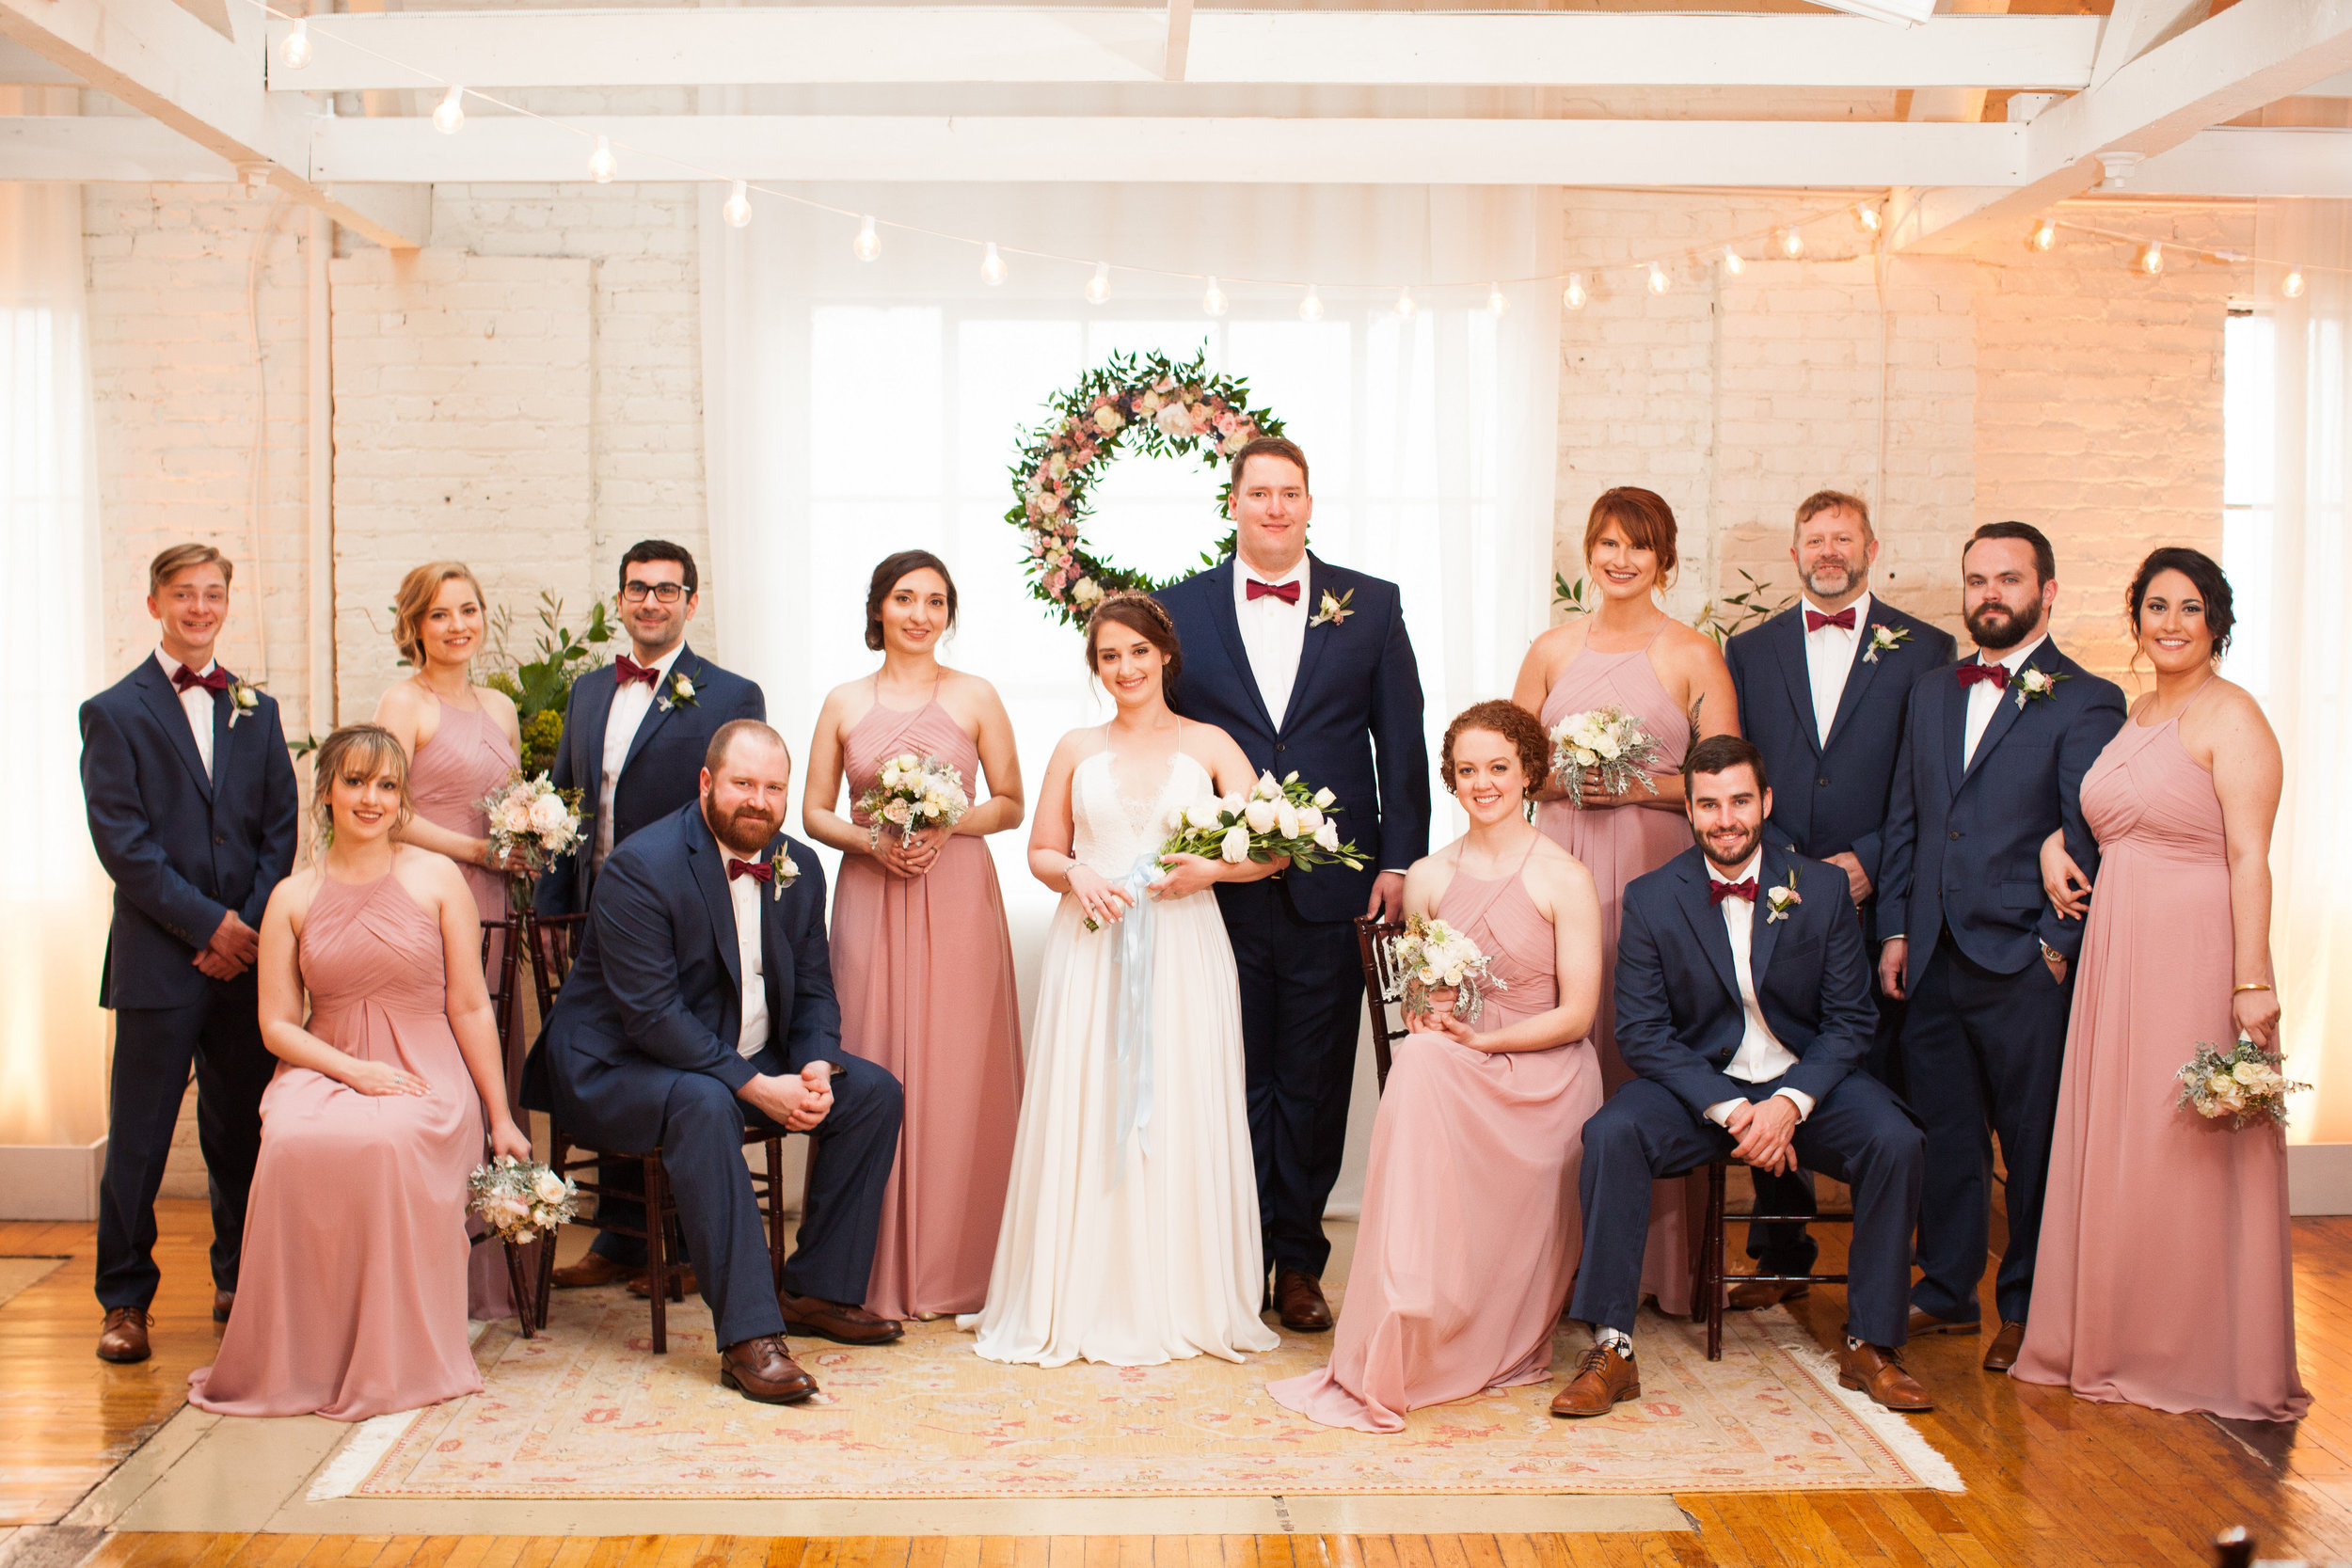 Handley Breaux Designs | Southern Wedding Planner, Southern Weddings, Southern Bride, Alabama Bride, Alabama Wedding Planner, Alabama Weddings, Birmingham Events, Birmingham Wedding Planner, Birmingham Bride